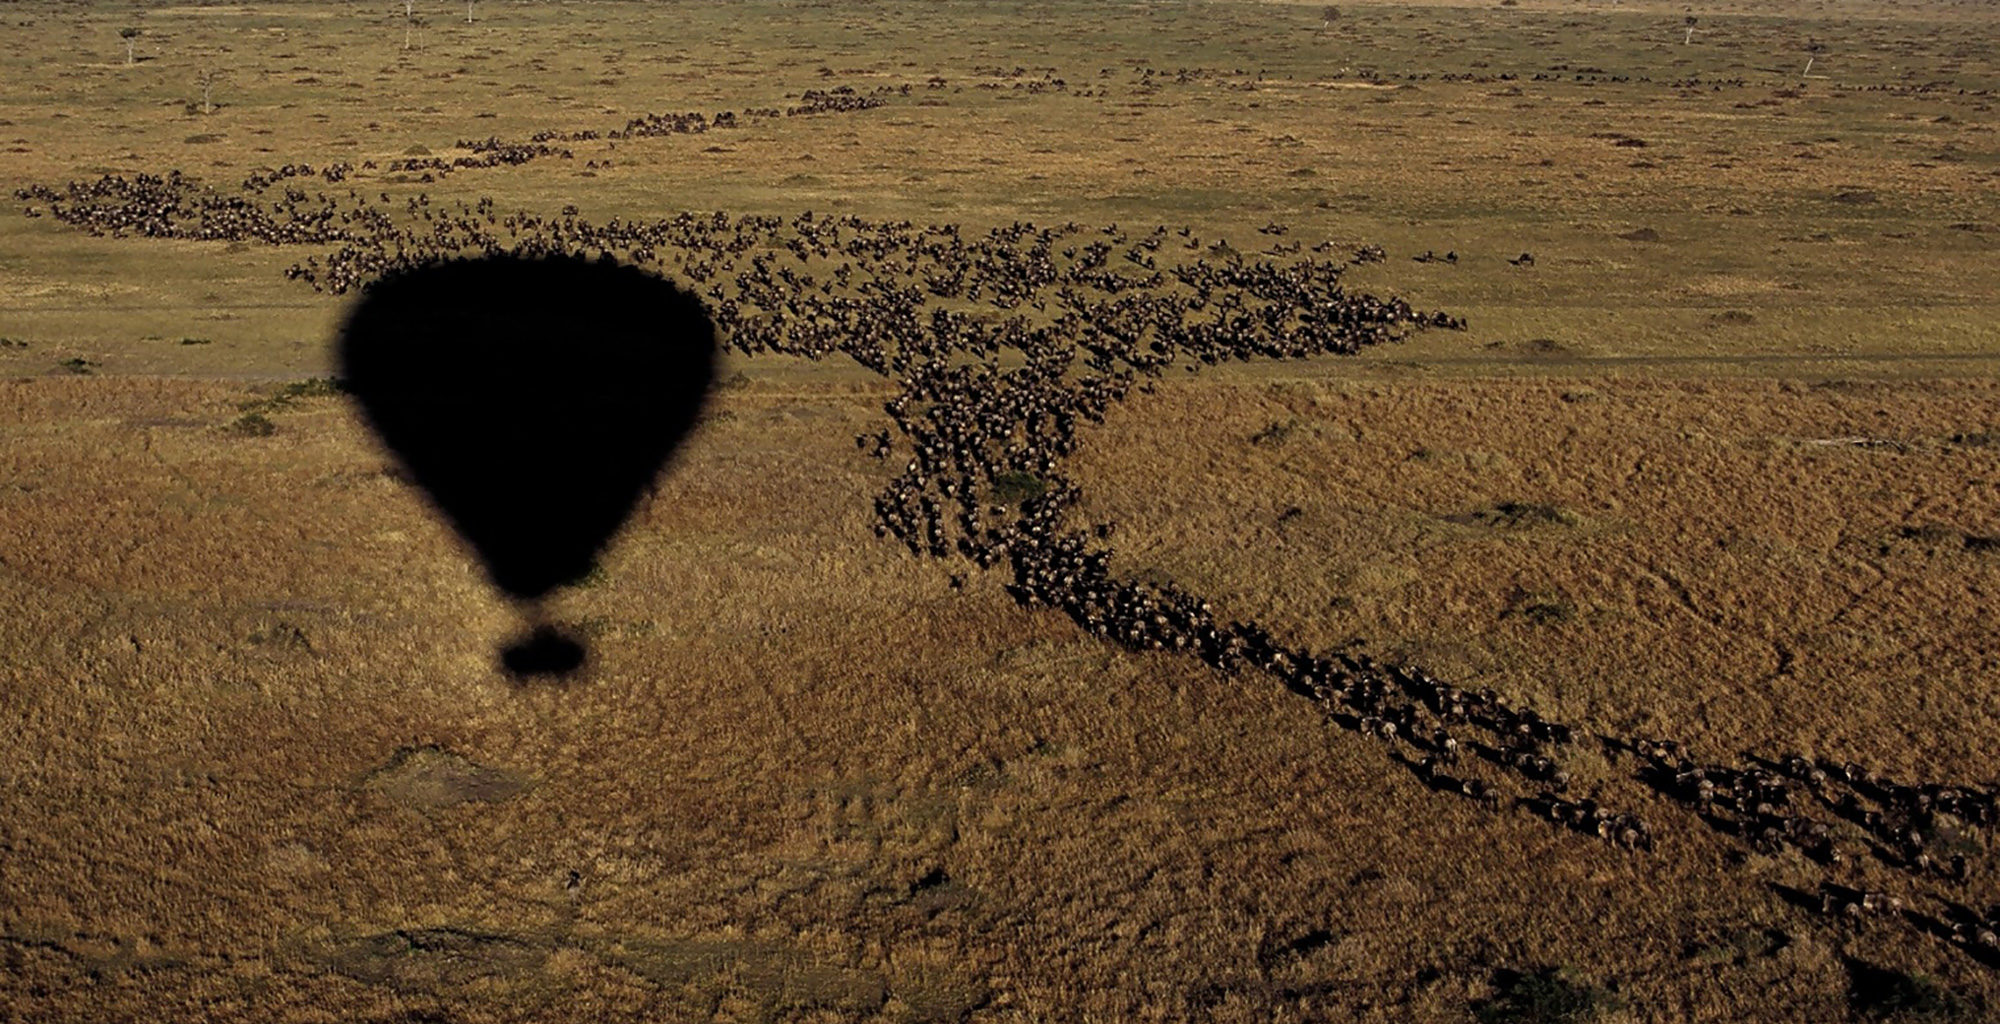 Kenya-Maasai-Mara-Aerial-Migration